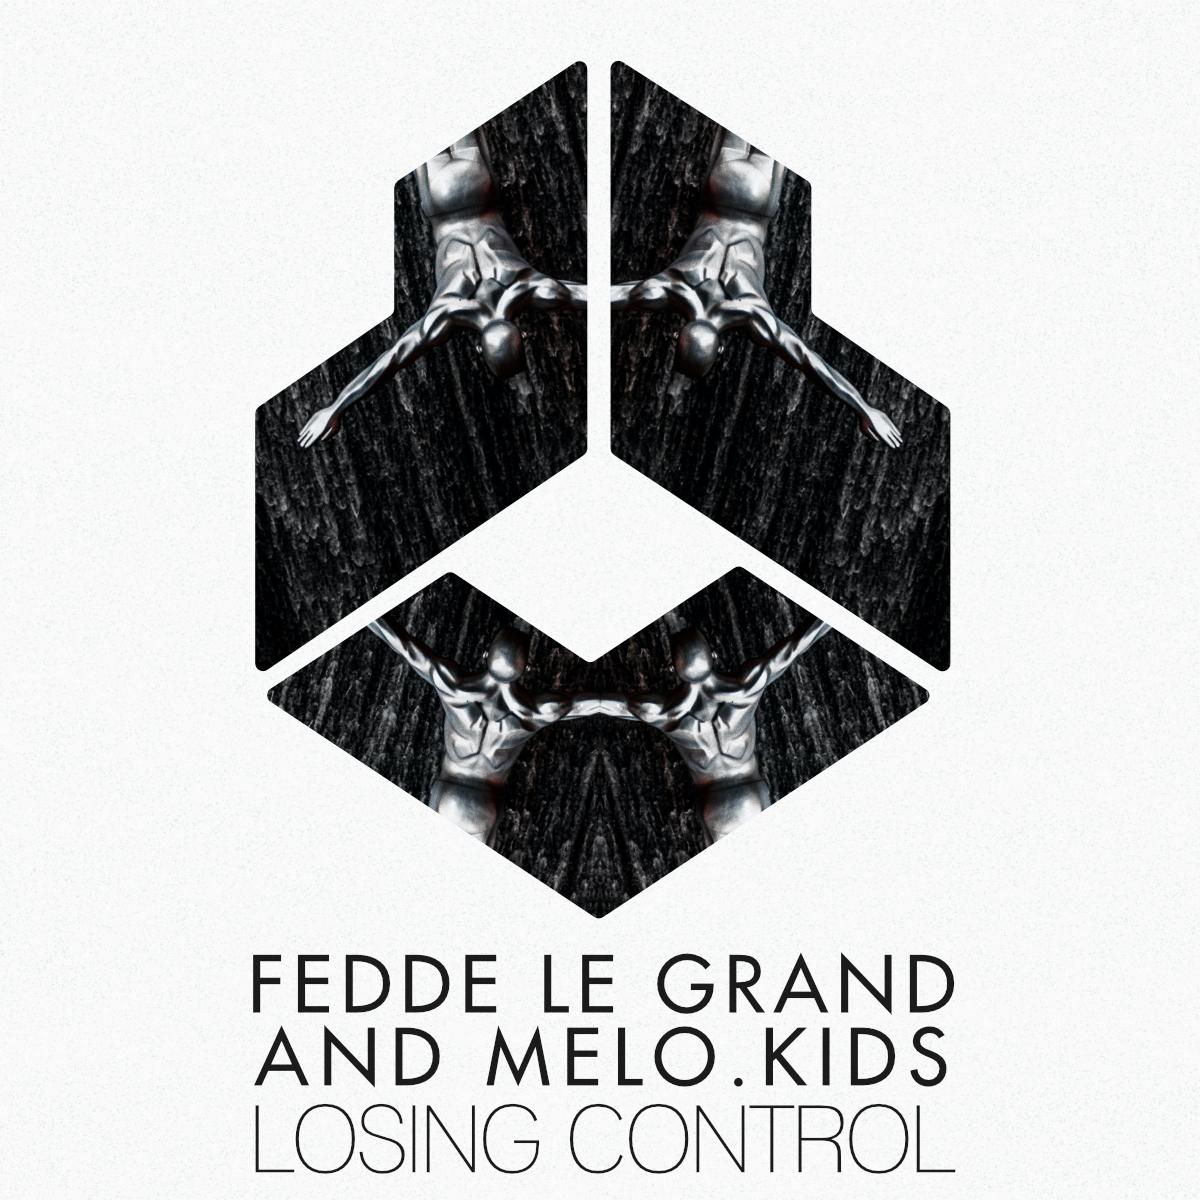 Fedde Le Grand Melo.Kids Losing Control